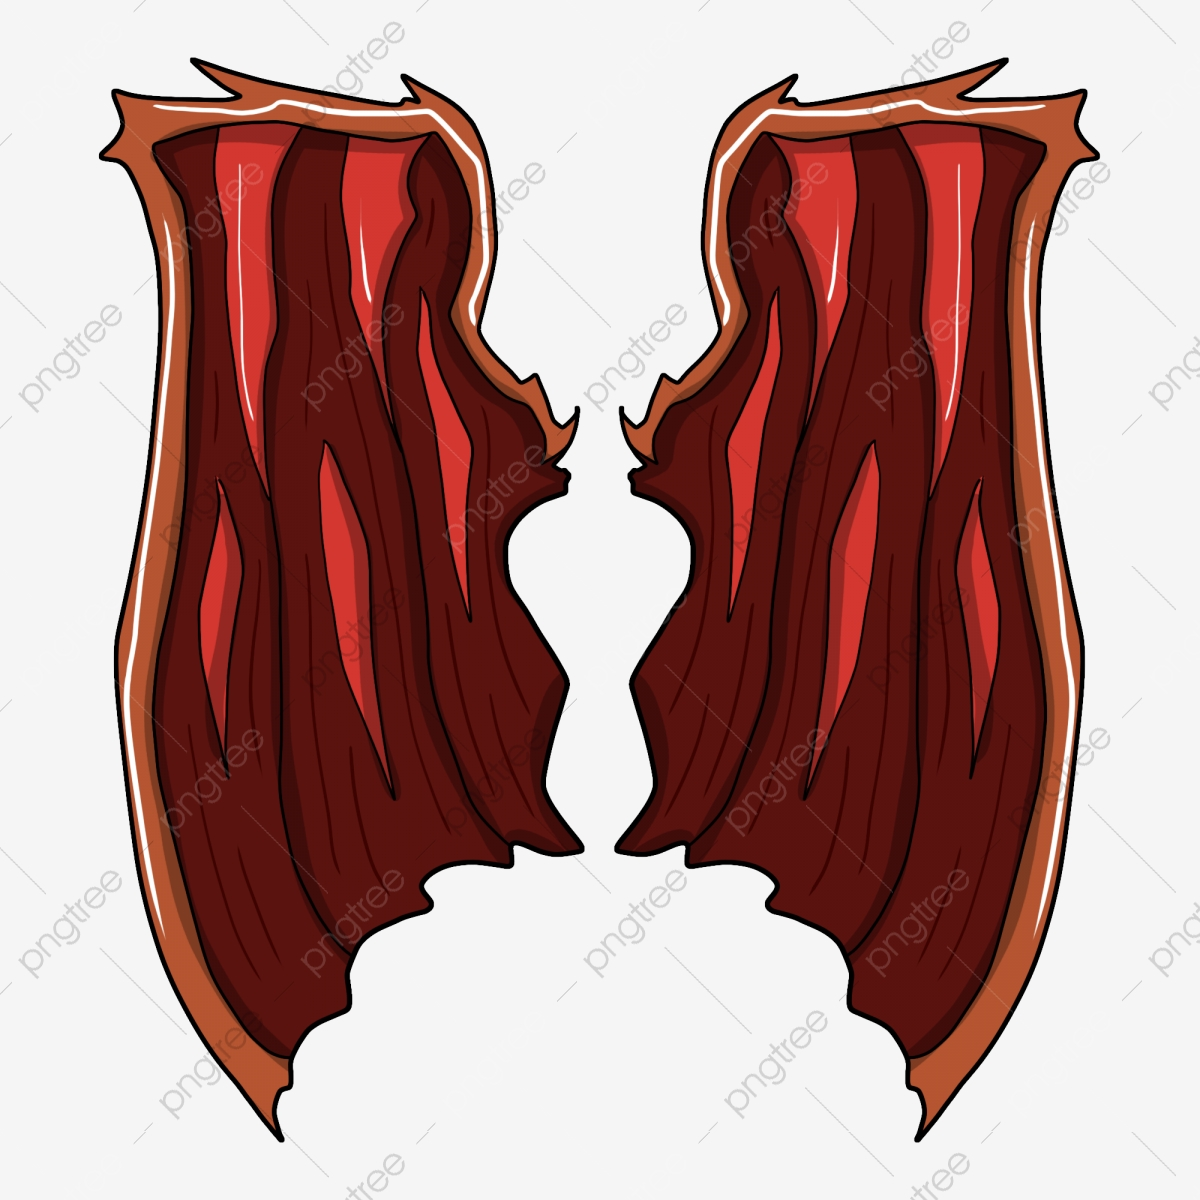 Devils Wings Illustrator Hand Painted Red Wings Red Demon Wing